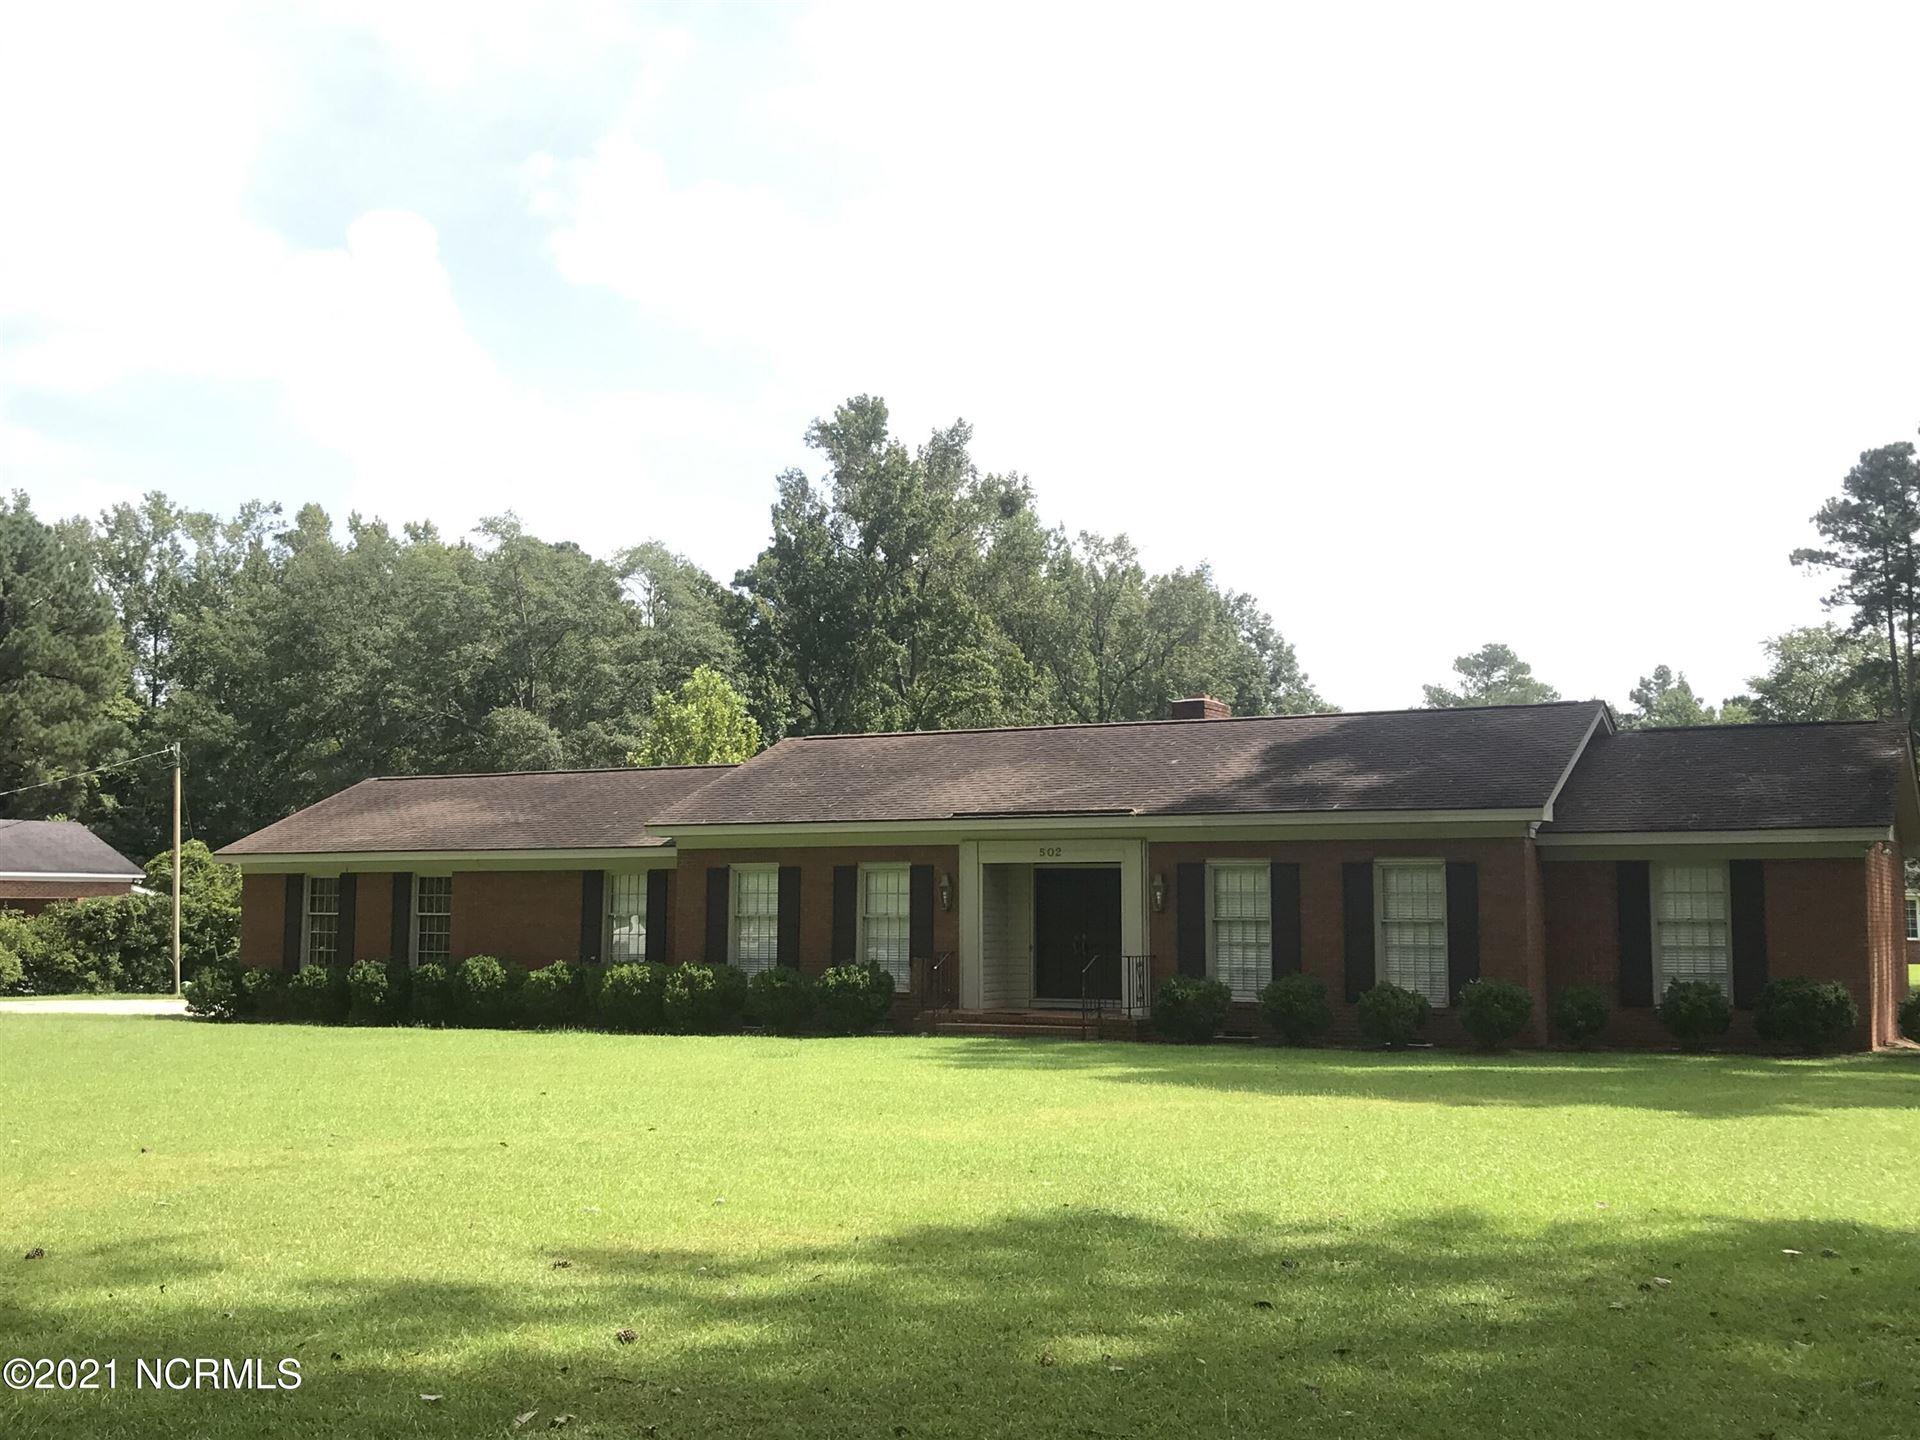 Photo of 502 Tram Road, Whiteville, NC 28472 (MLS # 100274743)